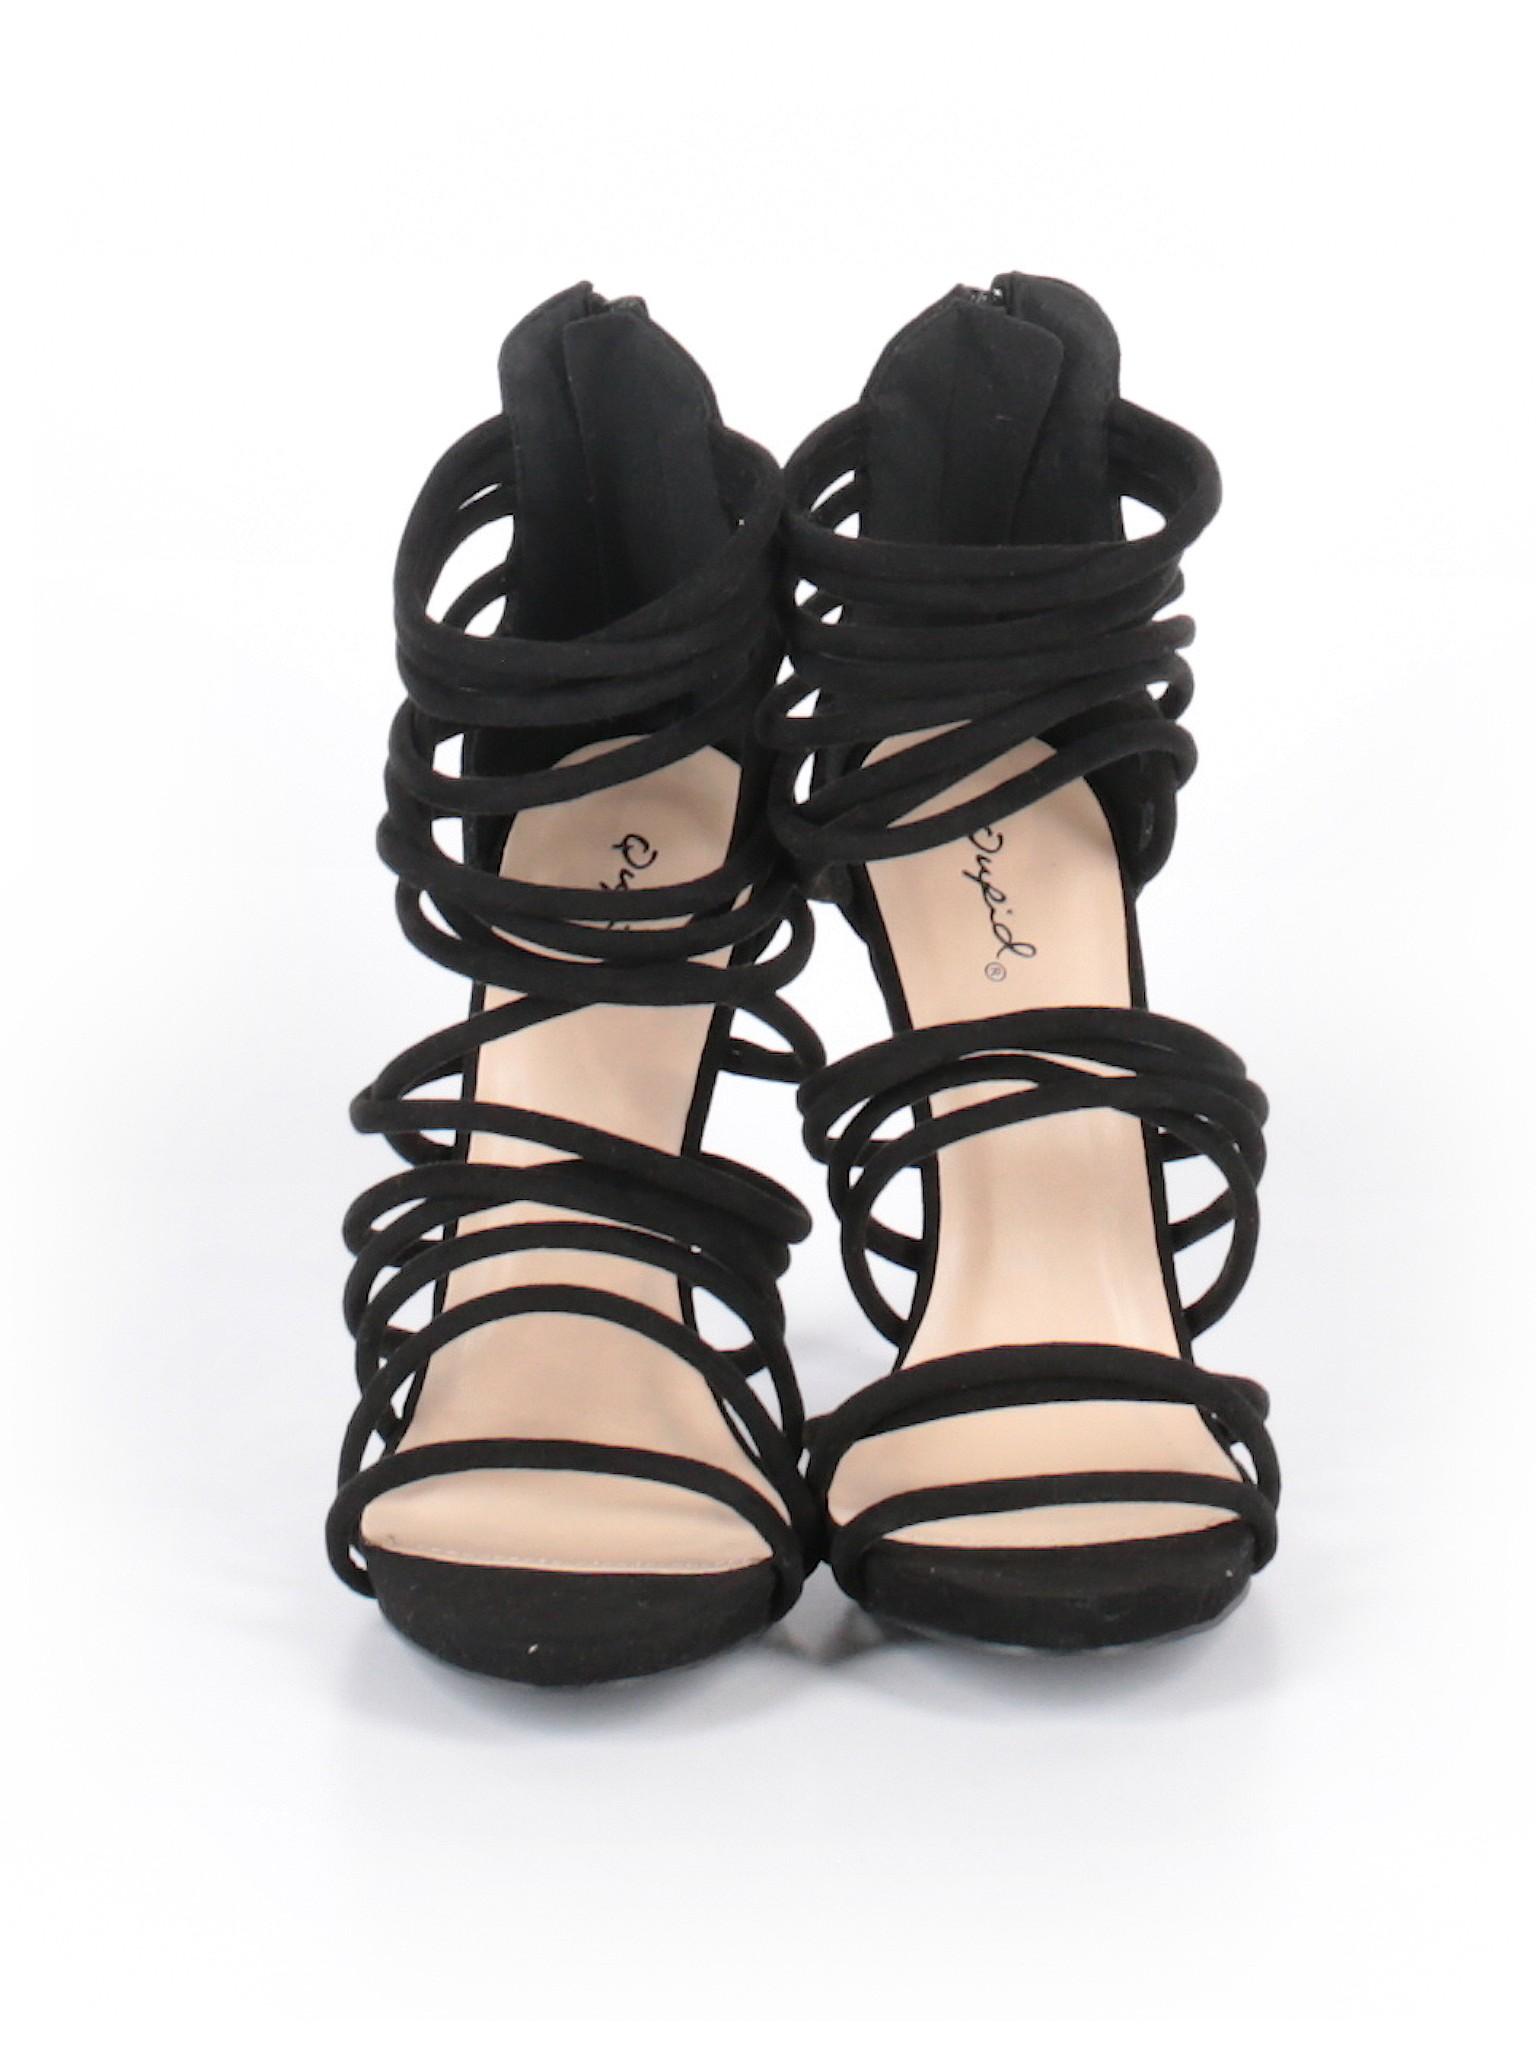 Heels Heels Qupid Qupid Qupid promotion Heels promotion Boutique promotion Boutique Boutique tq6Ozwp